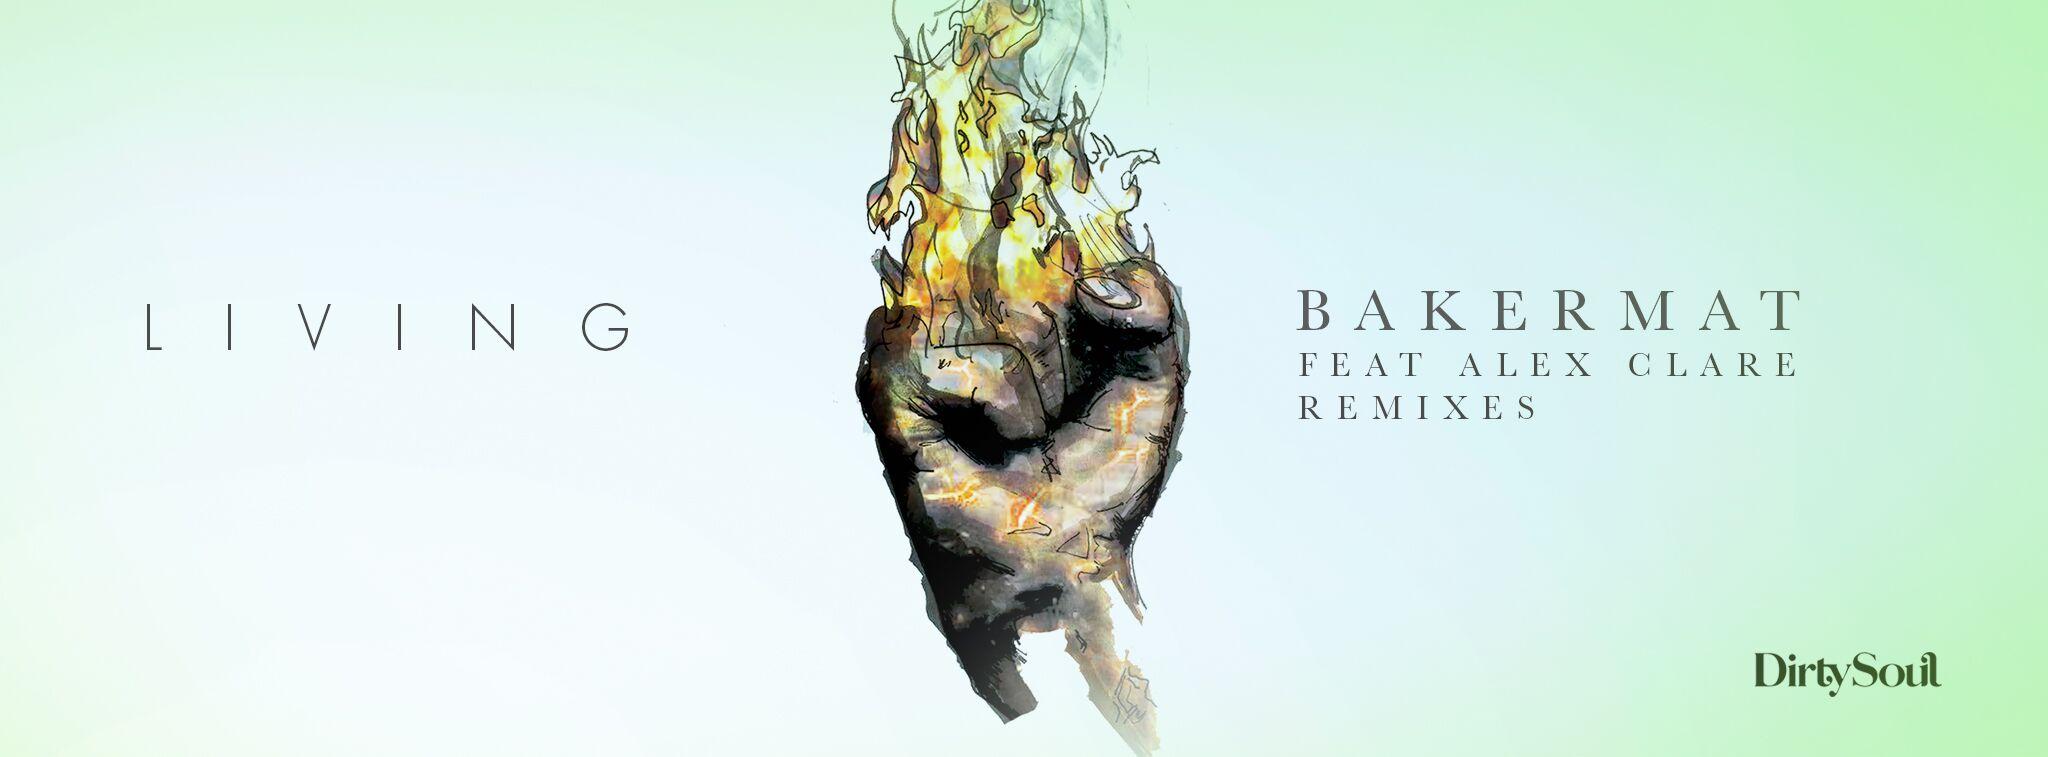 bakermat-justmusic-fr